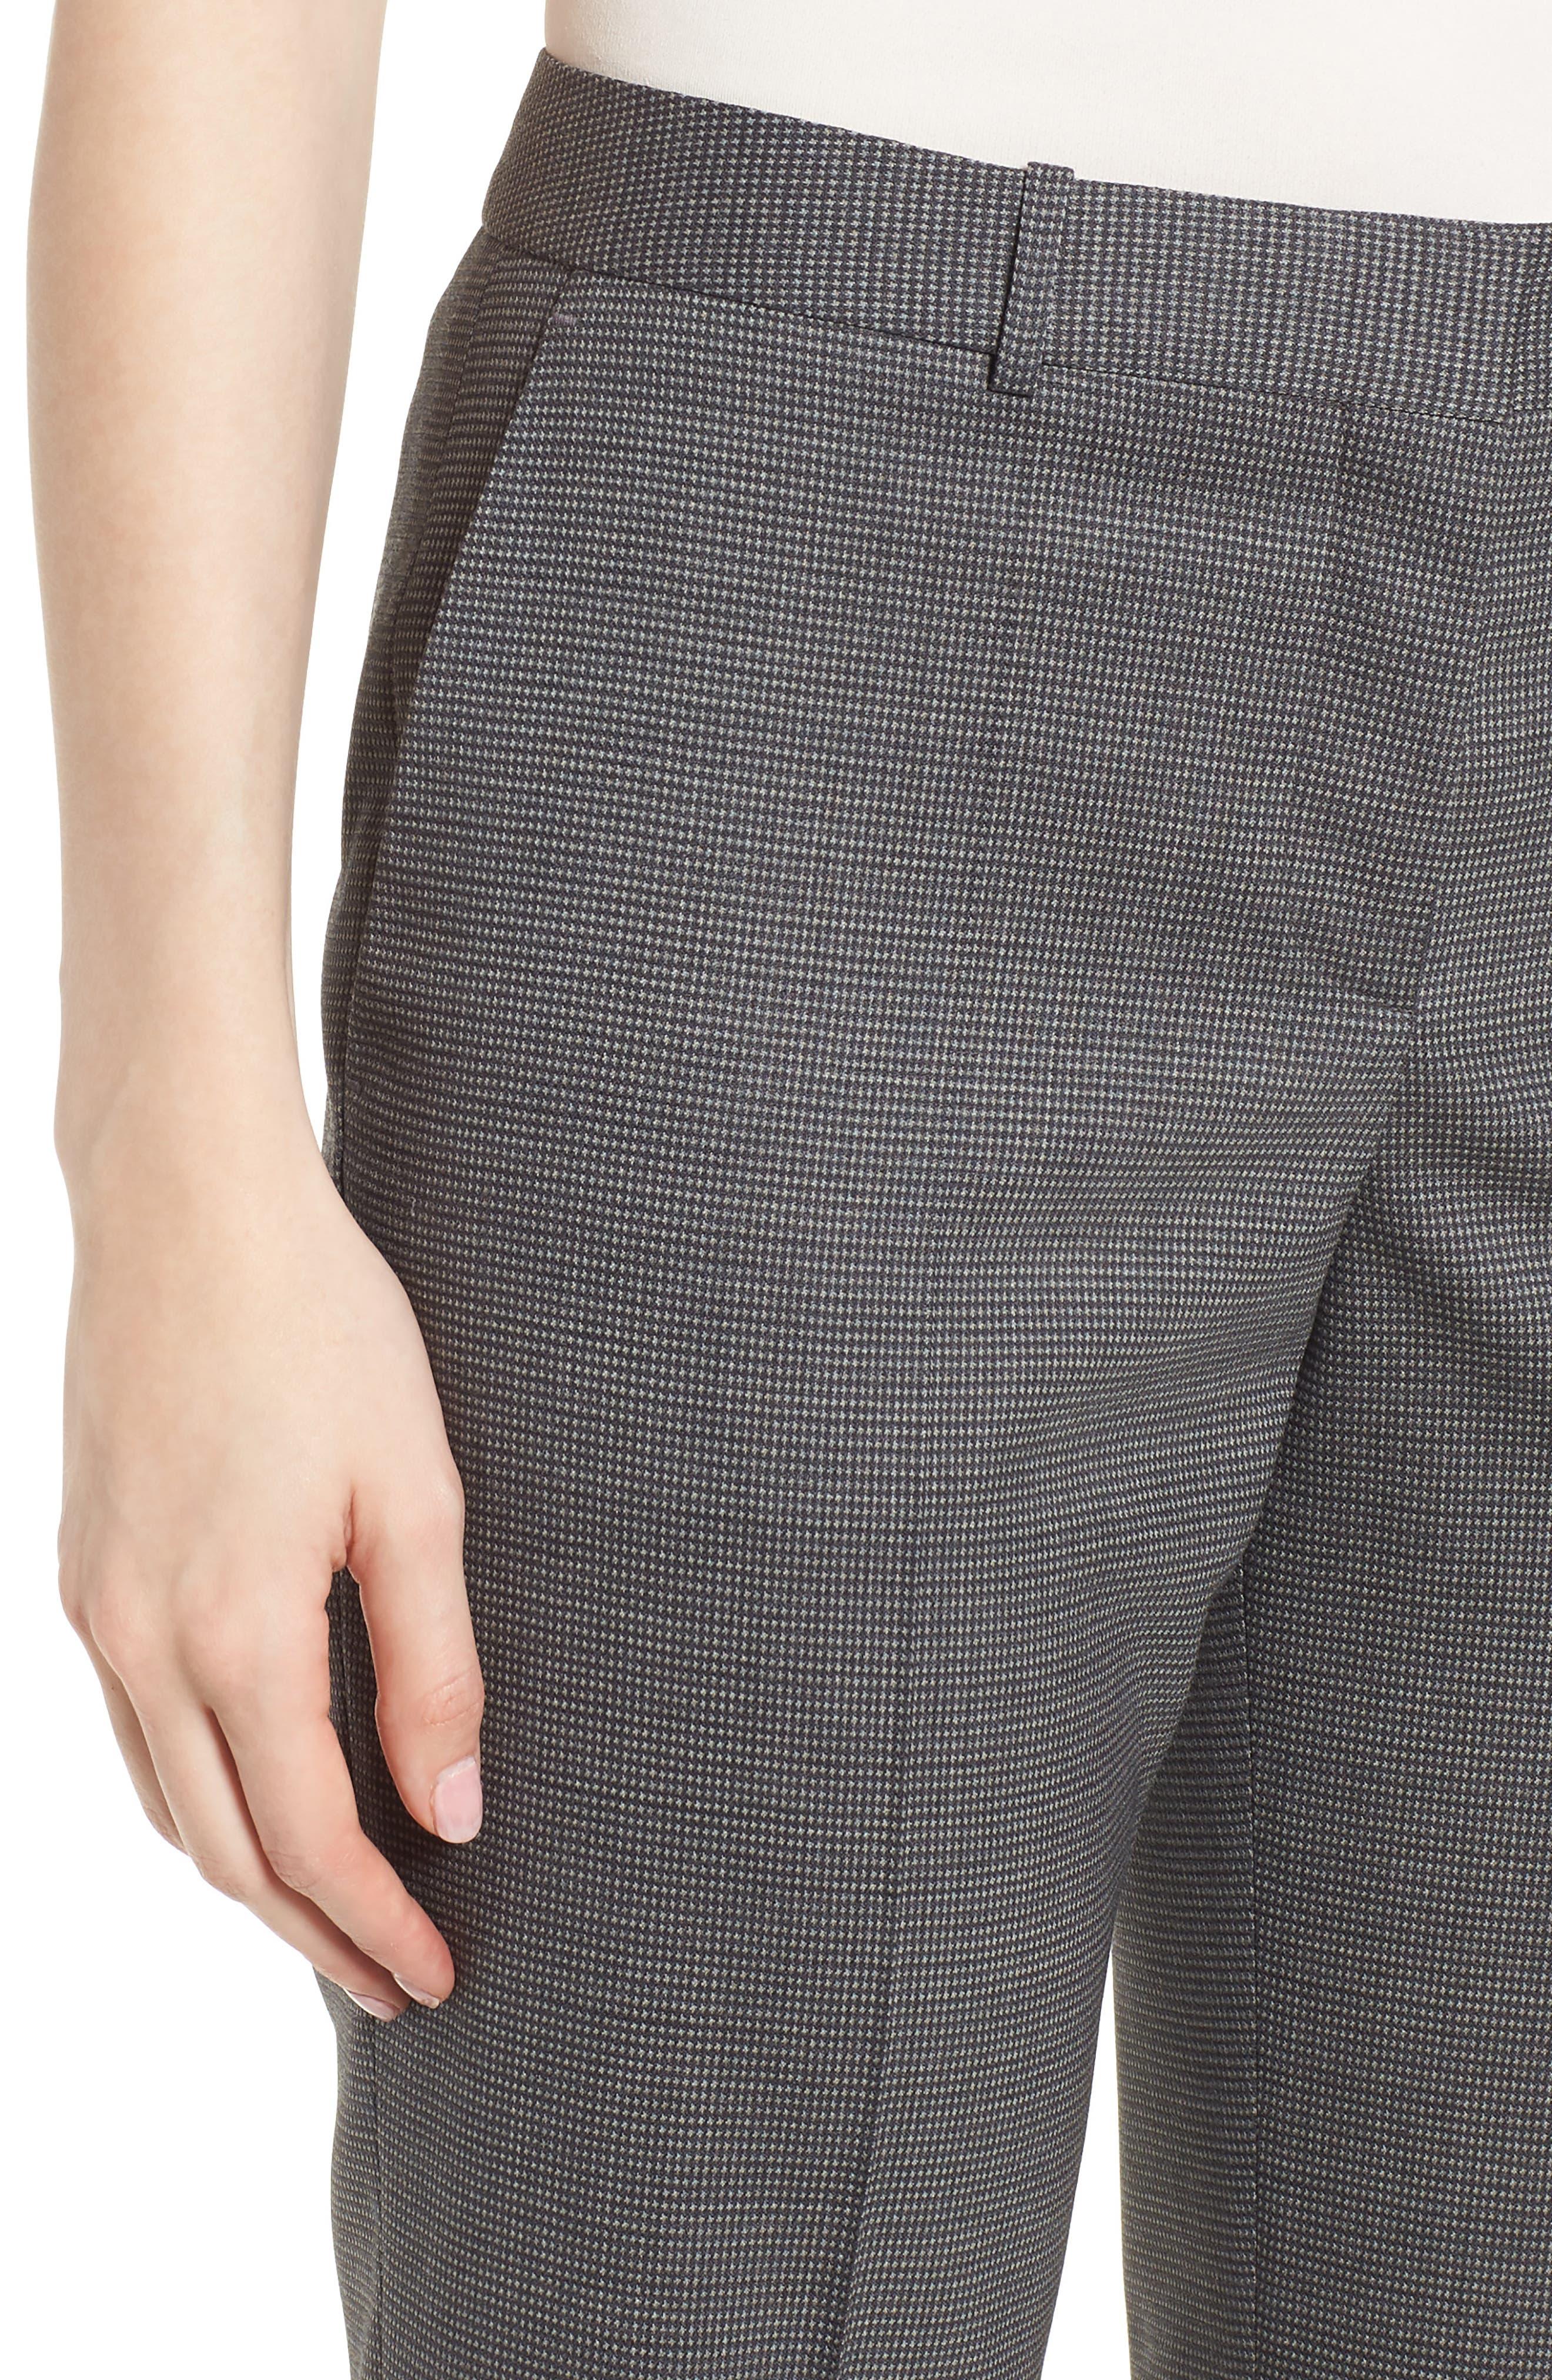 Tamea Minidessin Trousers,                             Alternate thumbnail 4, color,                             072